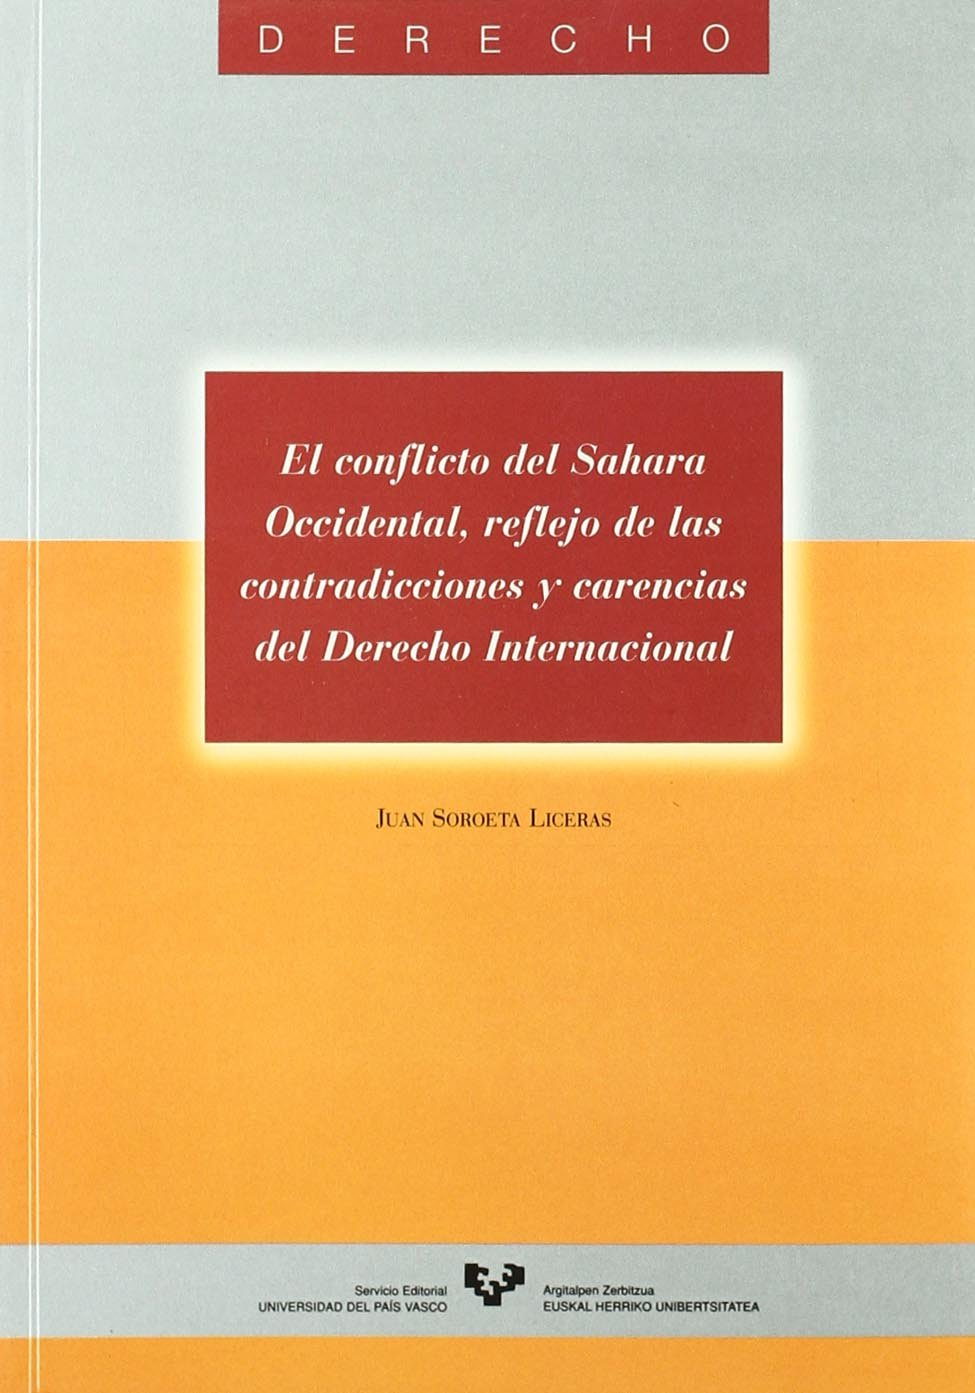 Conflicto del sahara occidental, el Tapa blanda – 12 nov 2008 Juan Soroeta Liceras Euskal Herriko Unibertsitatea 8475853137 Law / General